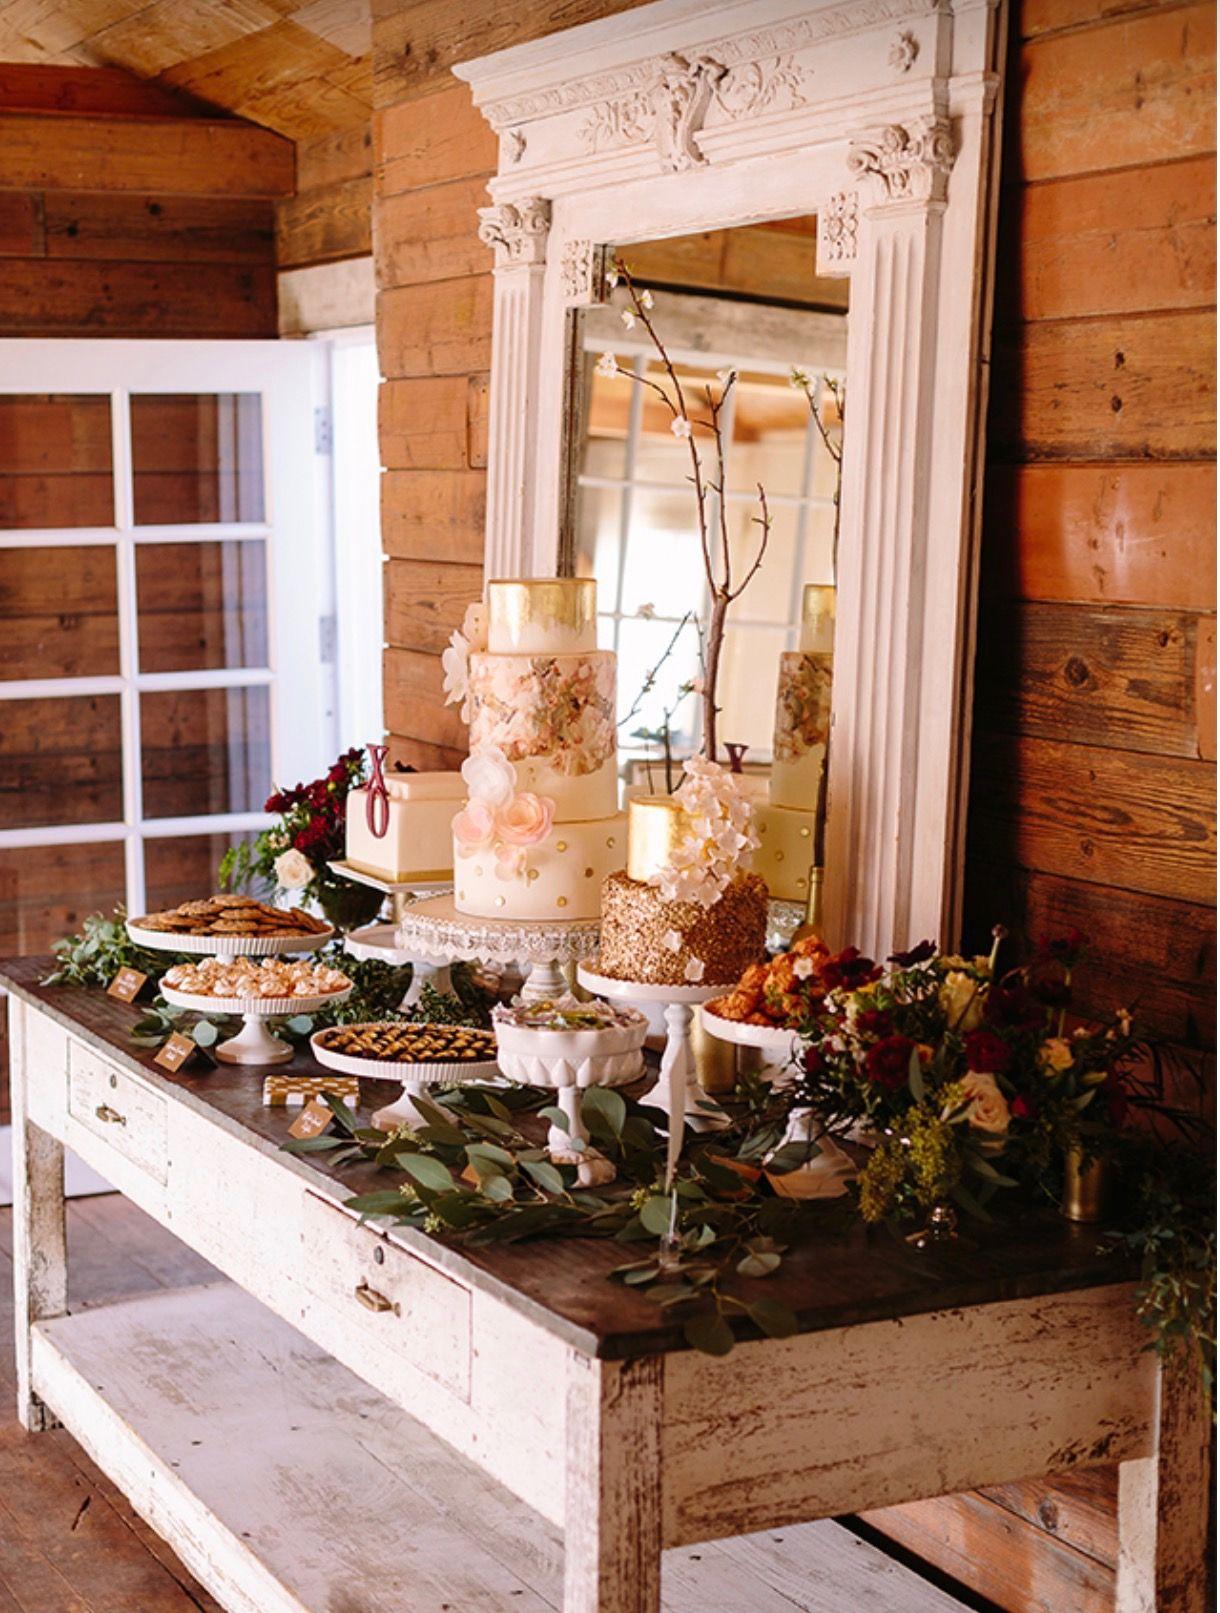 Pin by sasha crescentini on wedding cakedessert bar pinterest